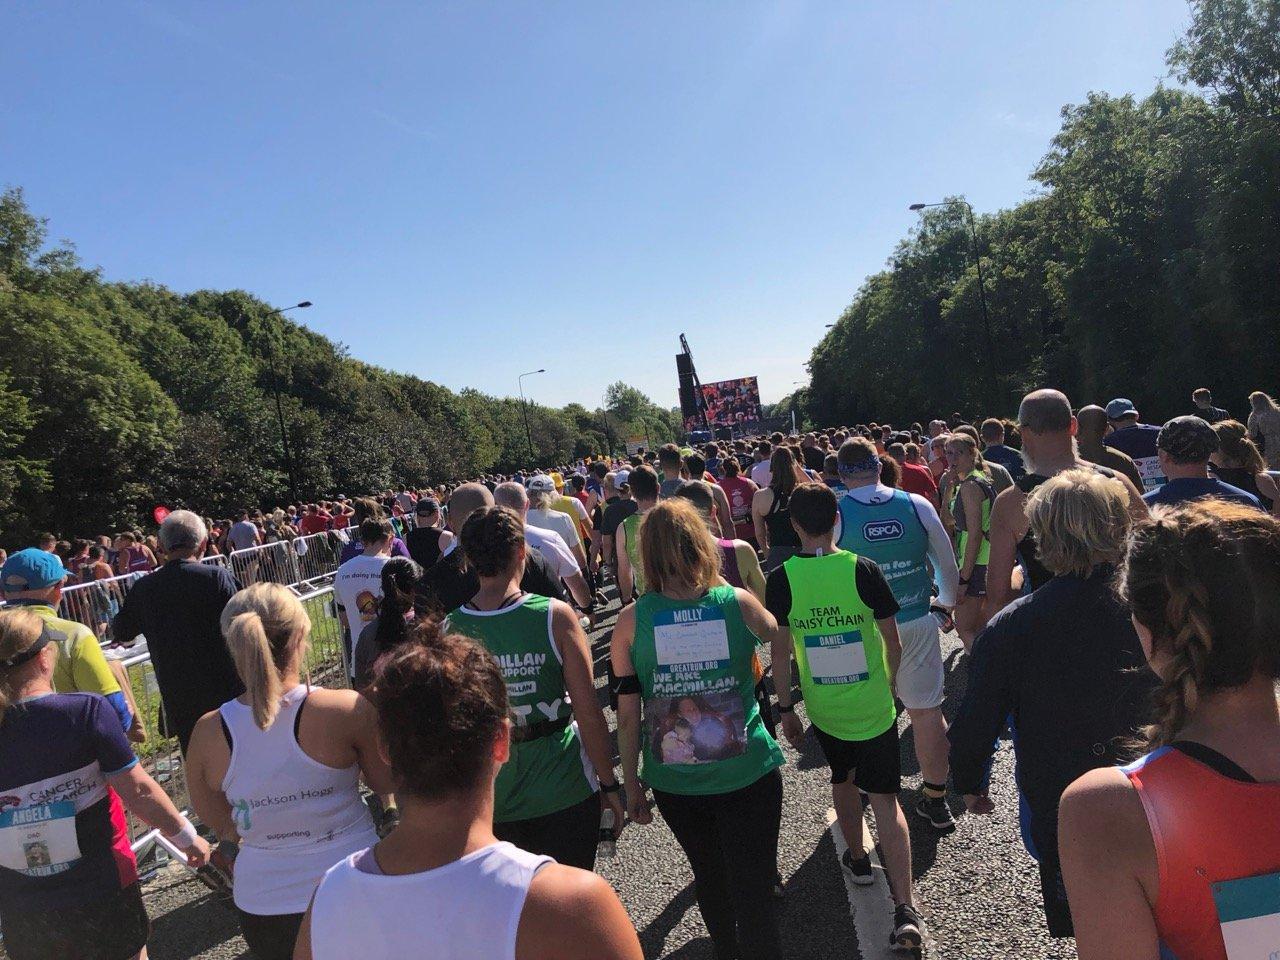 At the start, Great North Run 2019